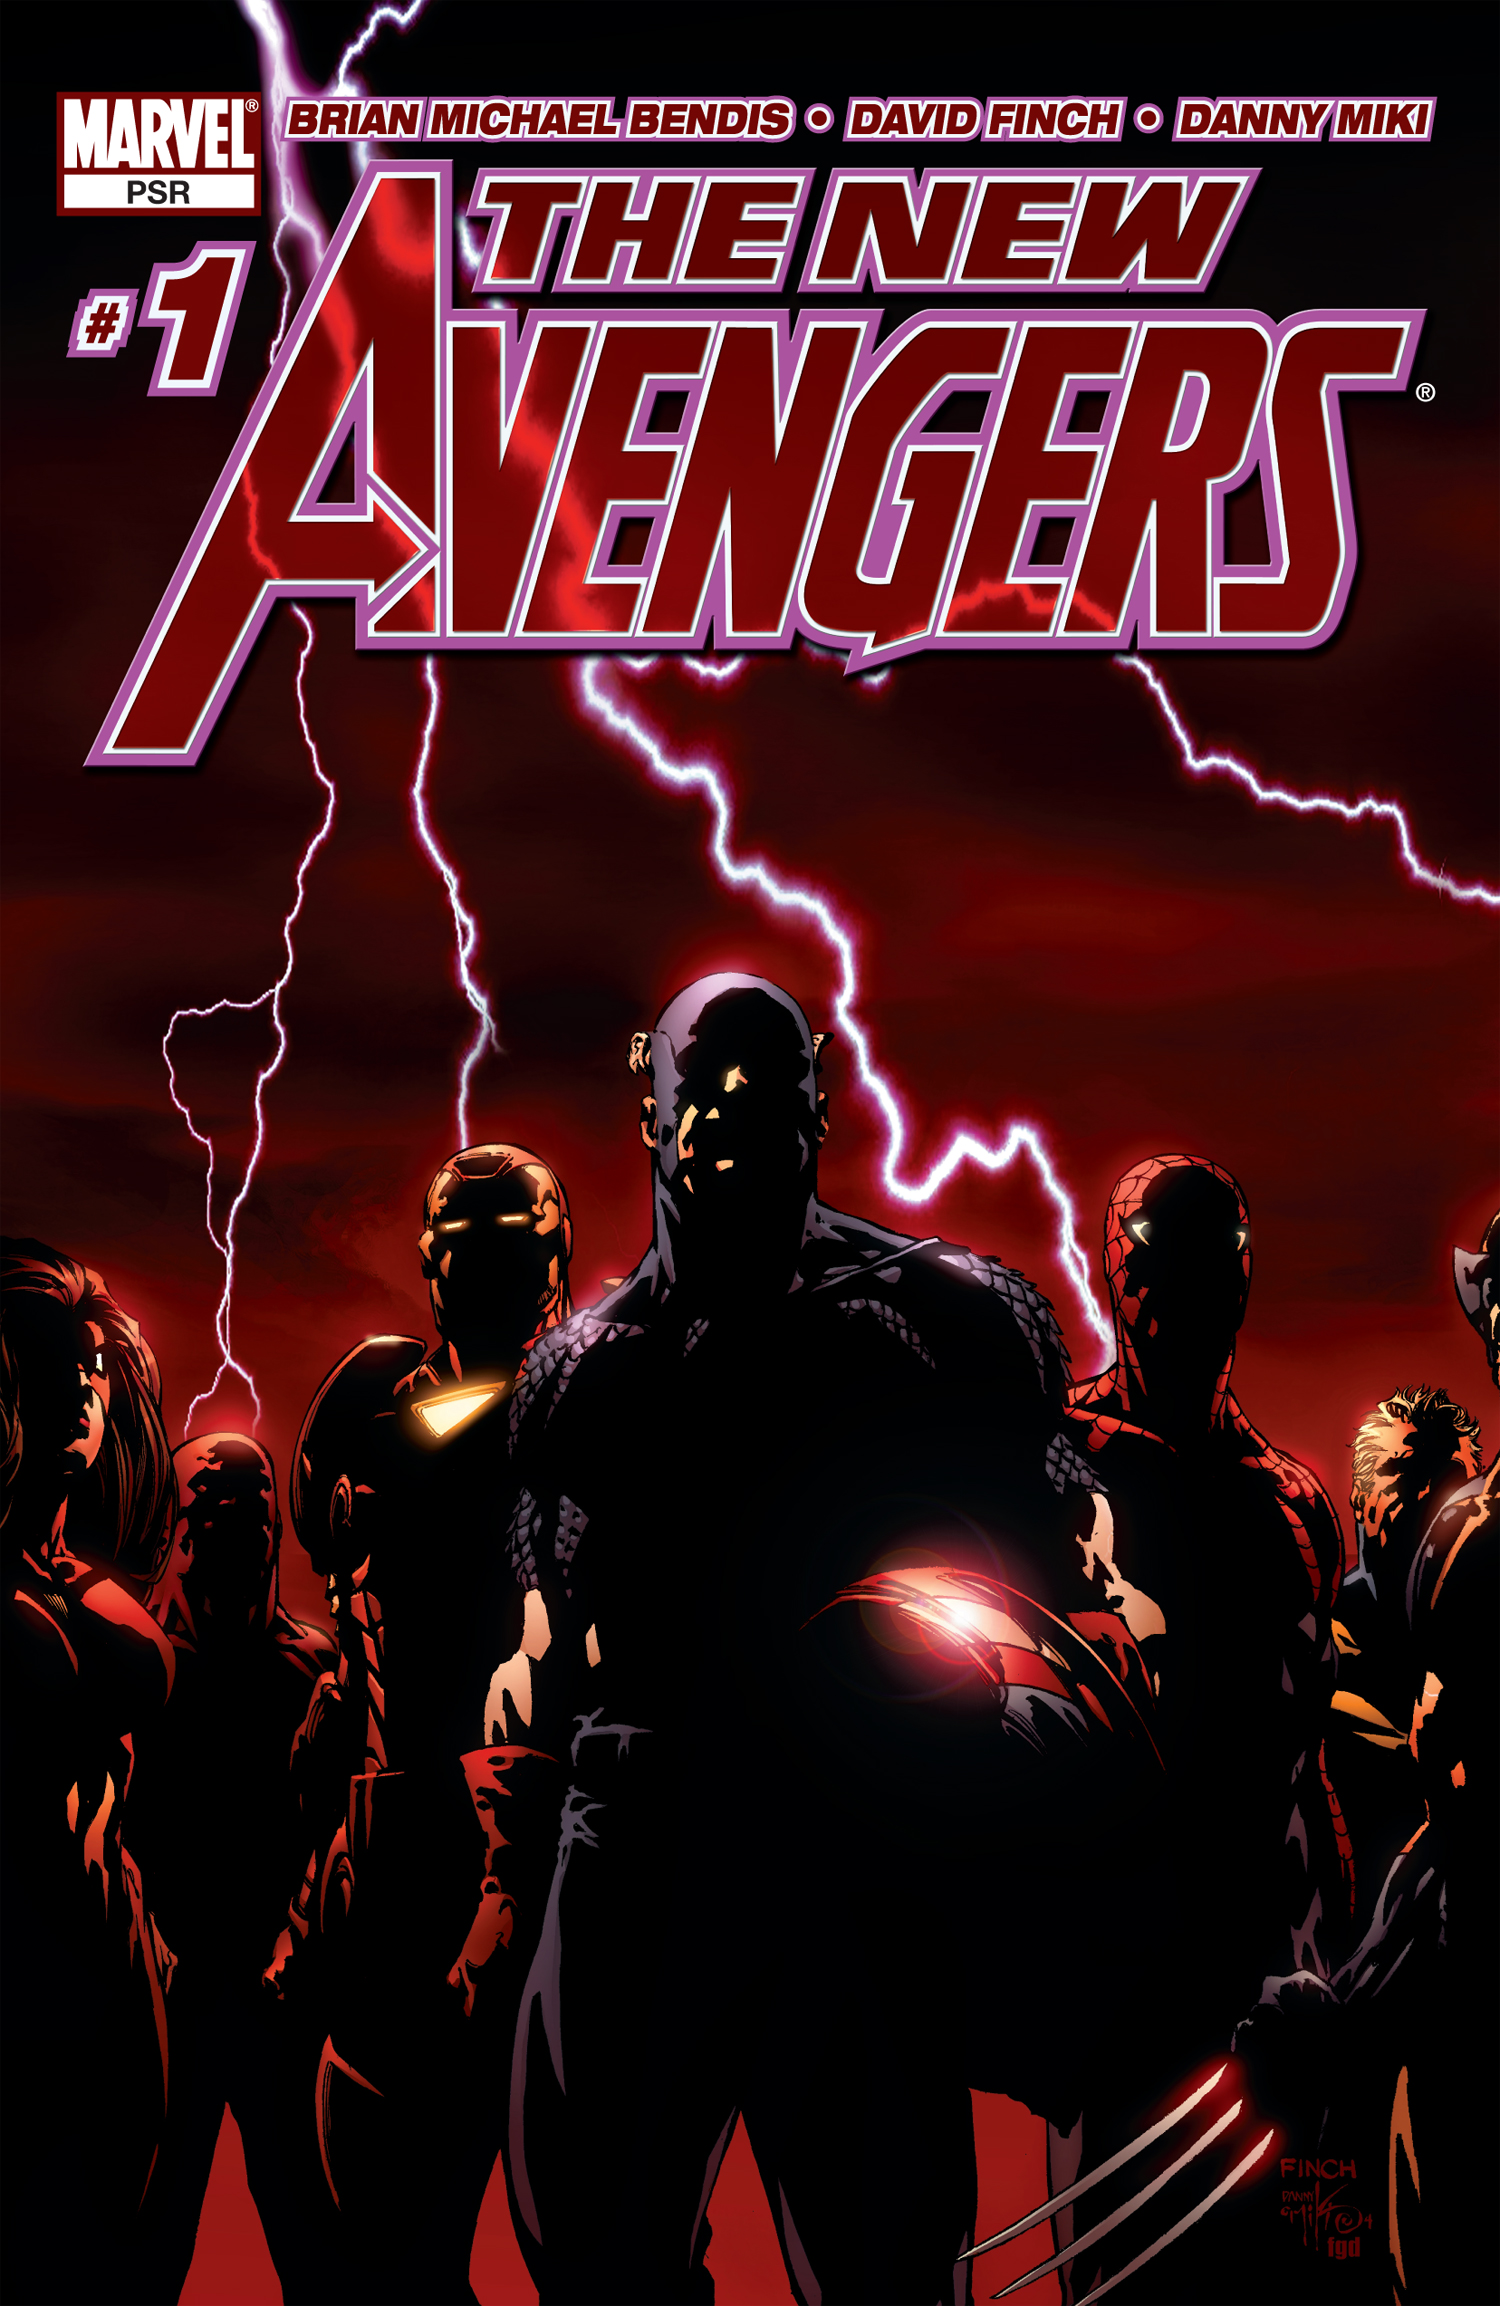 http://img3.wikia.nocookie.net/__cb20060507194607/marveldatabase/images/c/c8/New_Avengers_Vol_1_1.jpg